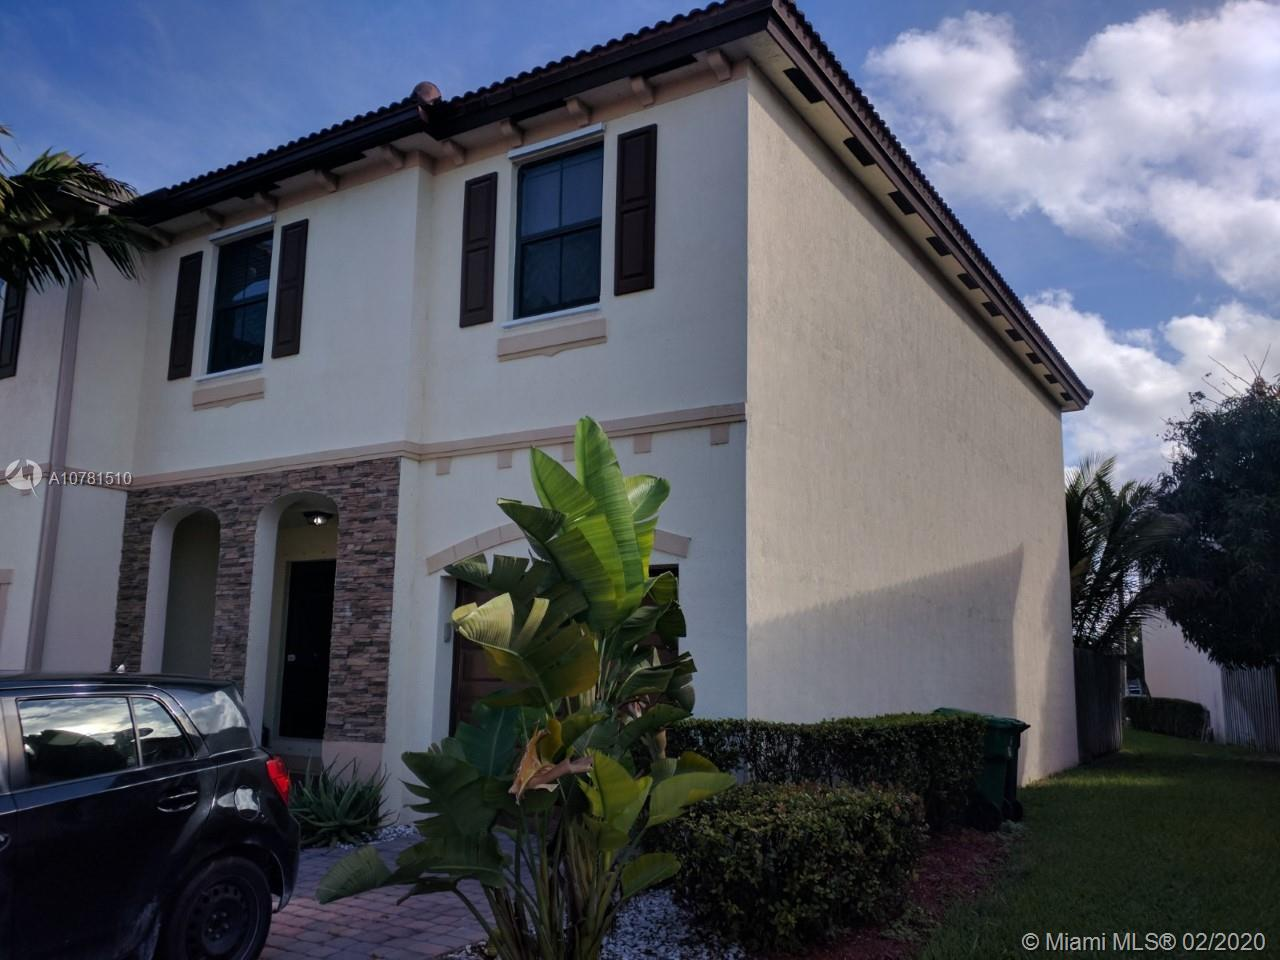 11354 SW 234th St, Homestead, FL 33032 - Homestead, FL real estate listing